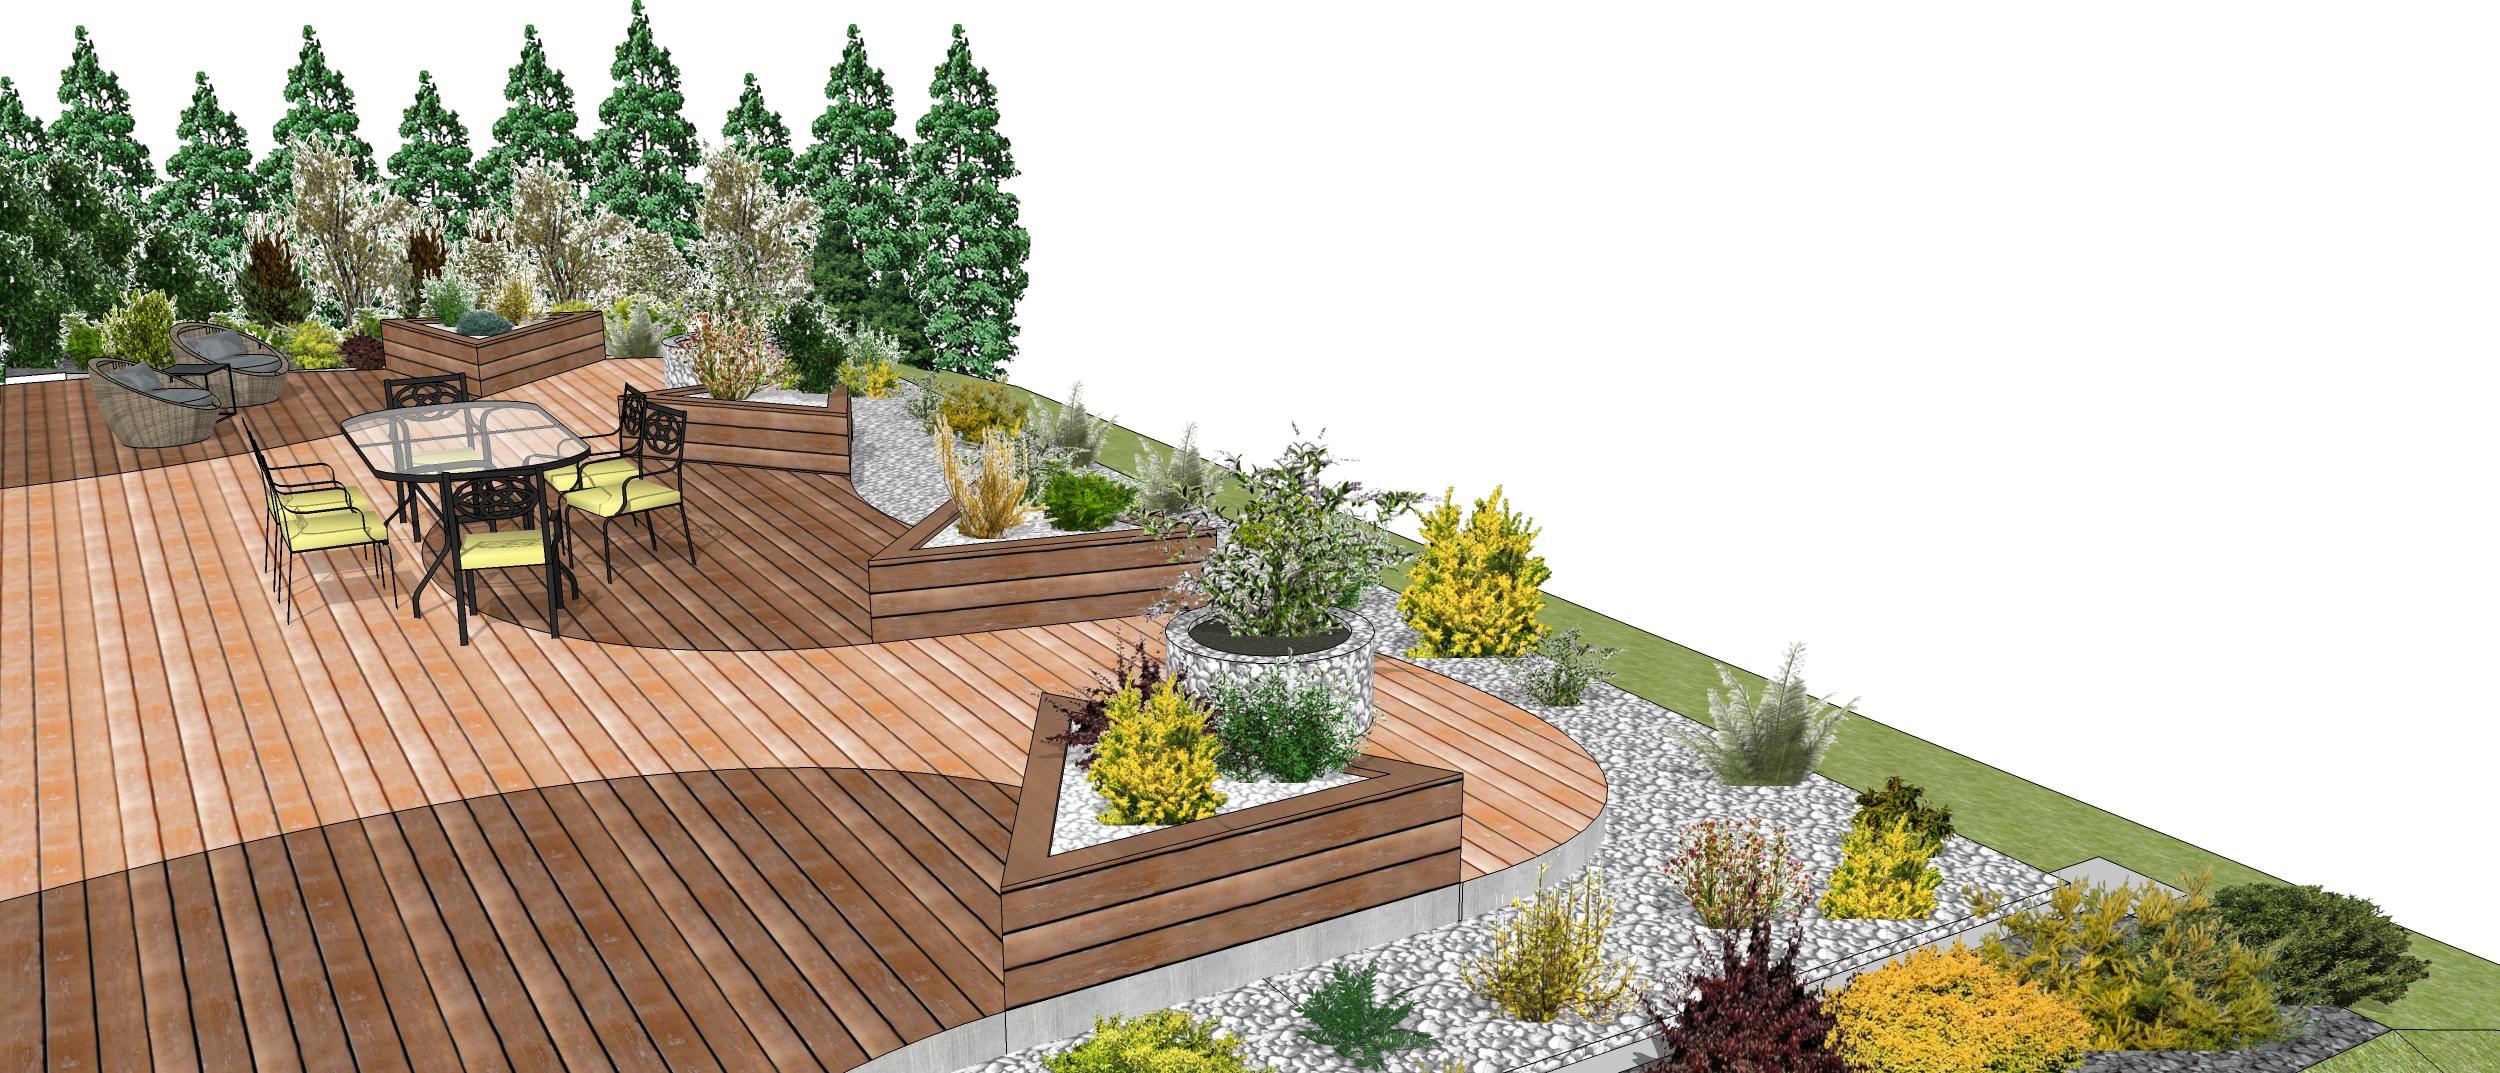 Exemple de jardin paysager gratuit for Jardin informatique